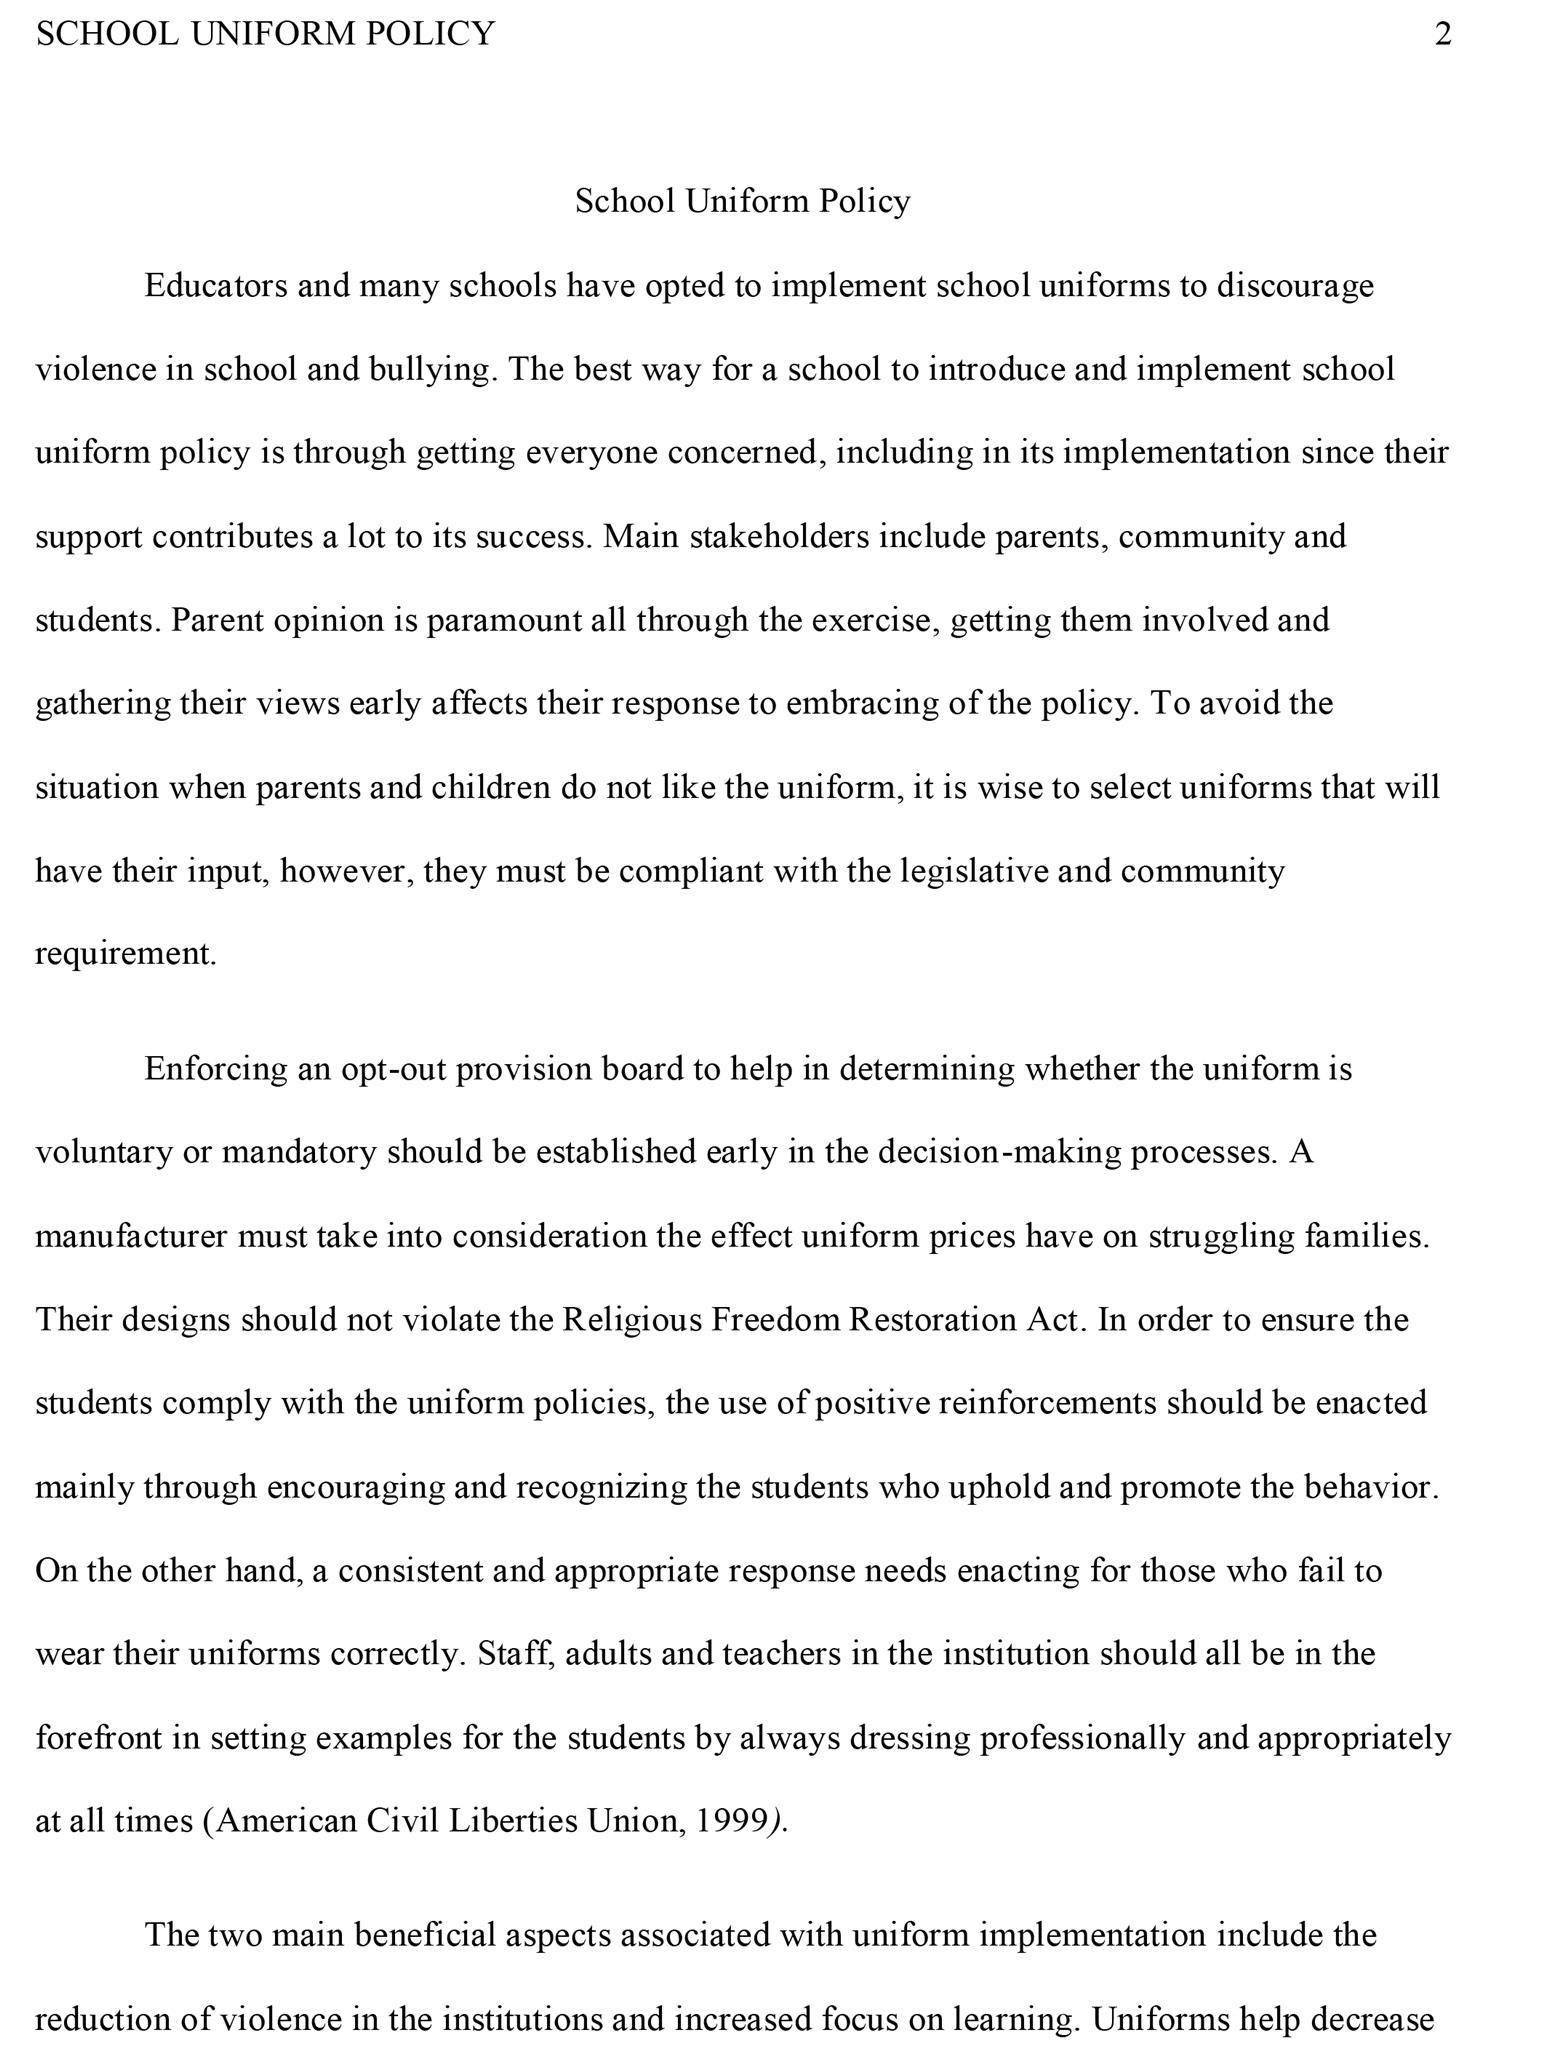 002 Essay Example School Sample Impressive Uniforms Against Conclusion Outline Full